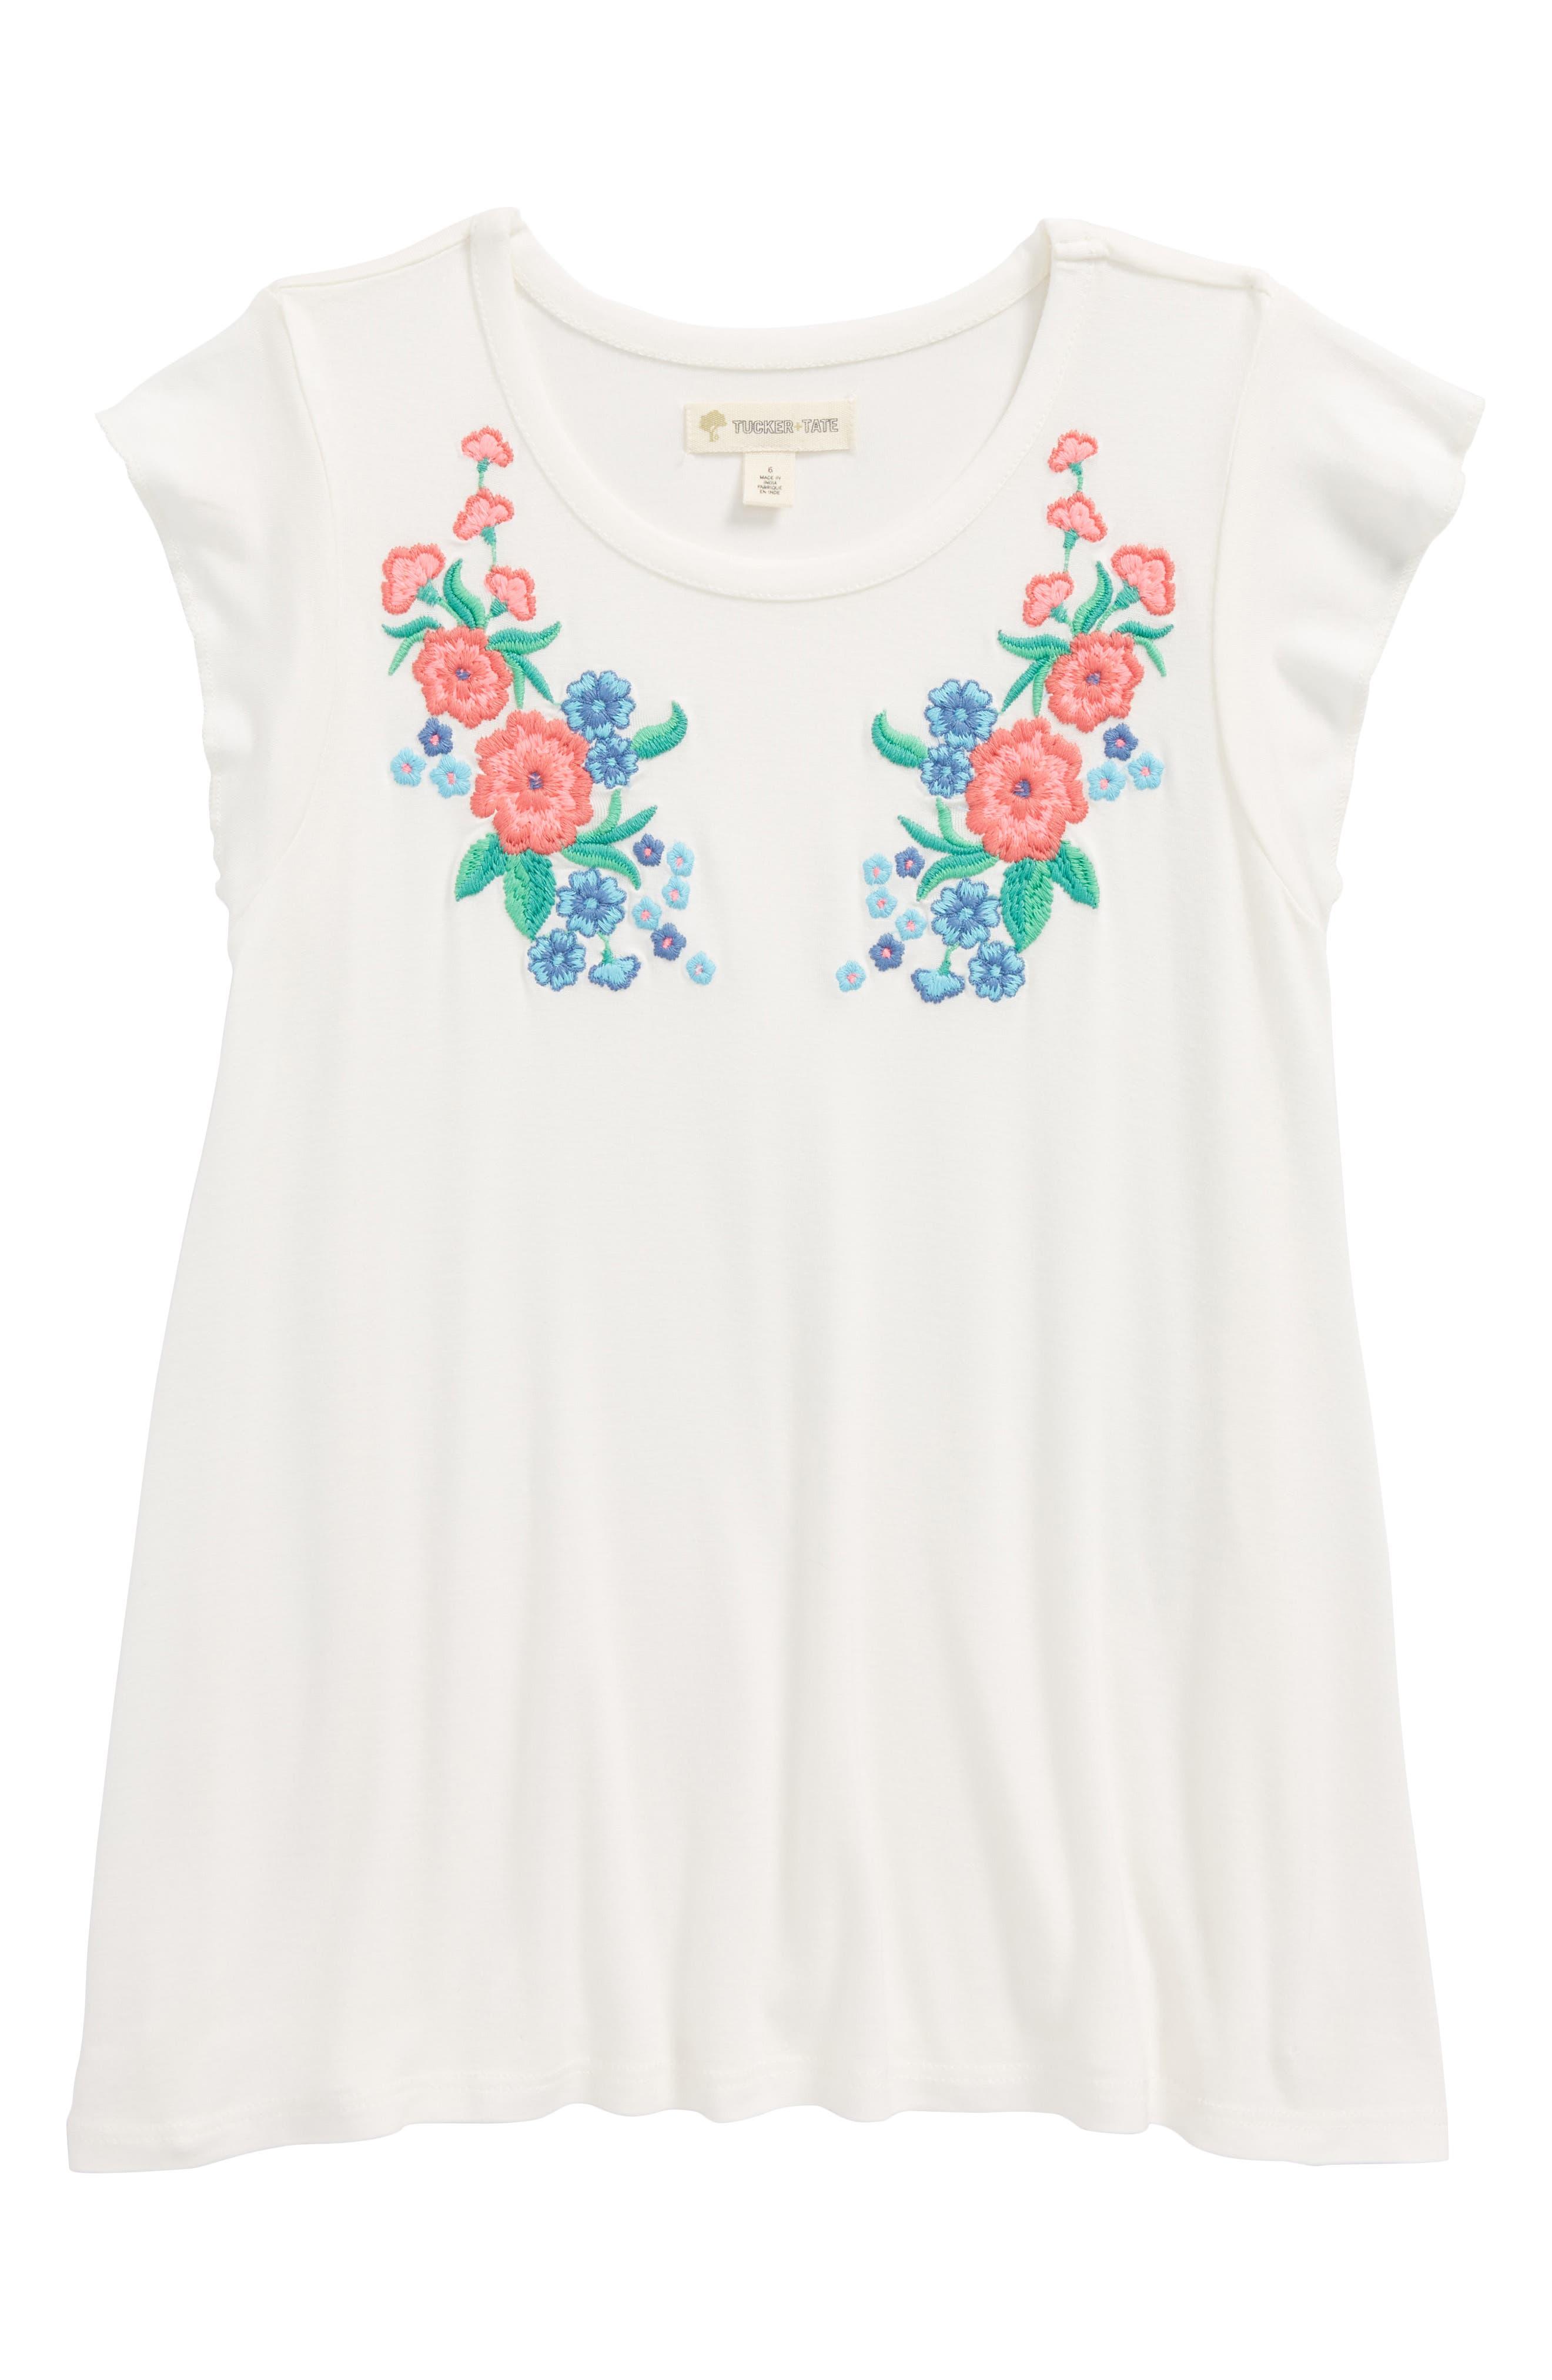 Main Image - Tucker + Tate Floral Embroidered Flutter Sleeve Tee (Toddler Girls, Little Girls & Big Girls)